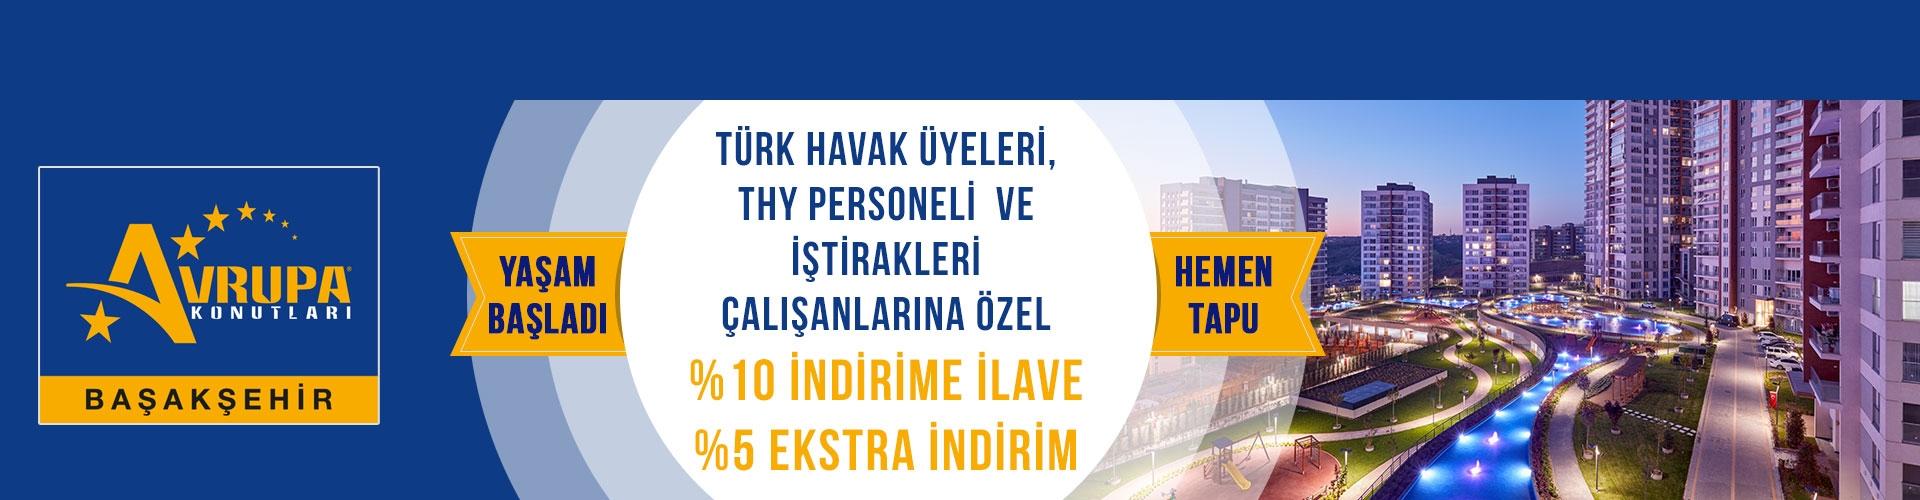 turkhavak-web-protfolyo-sayfasi